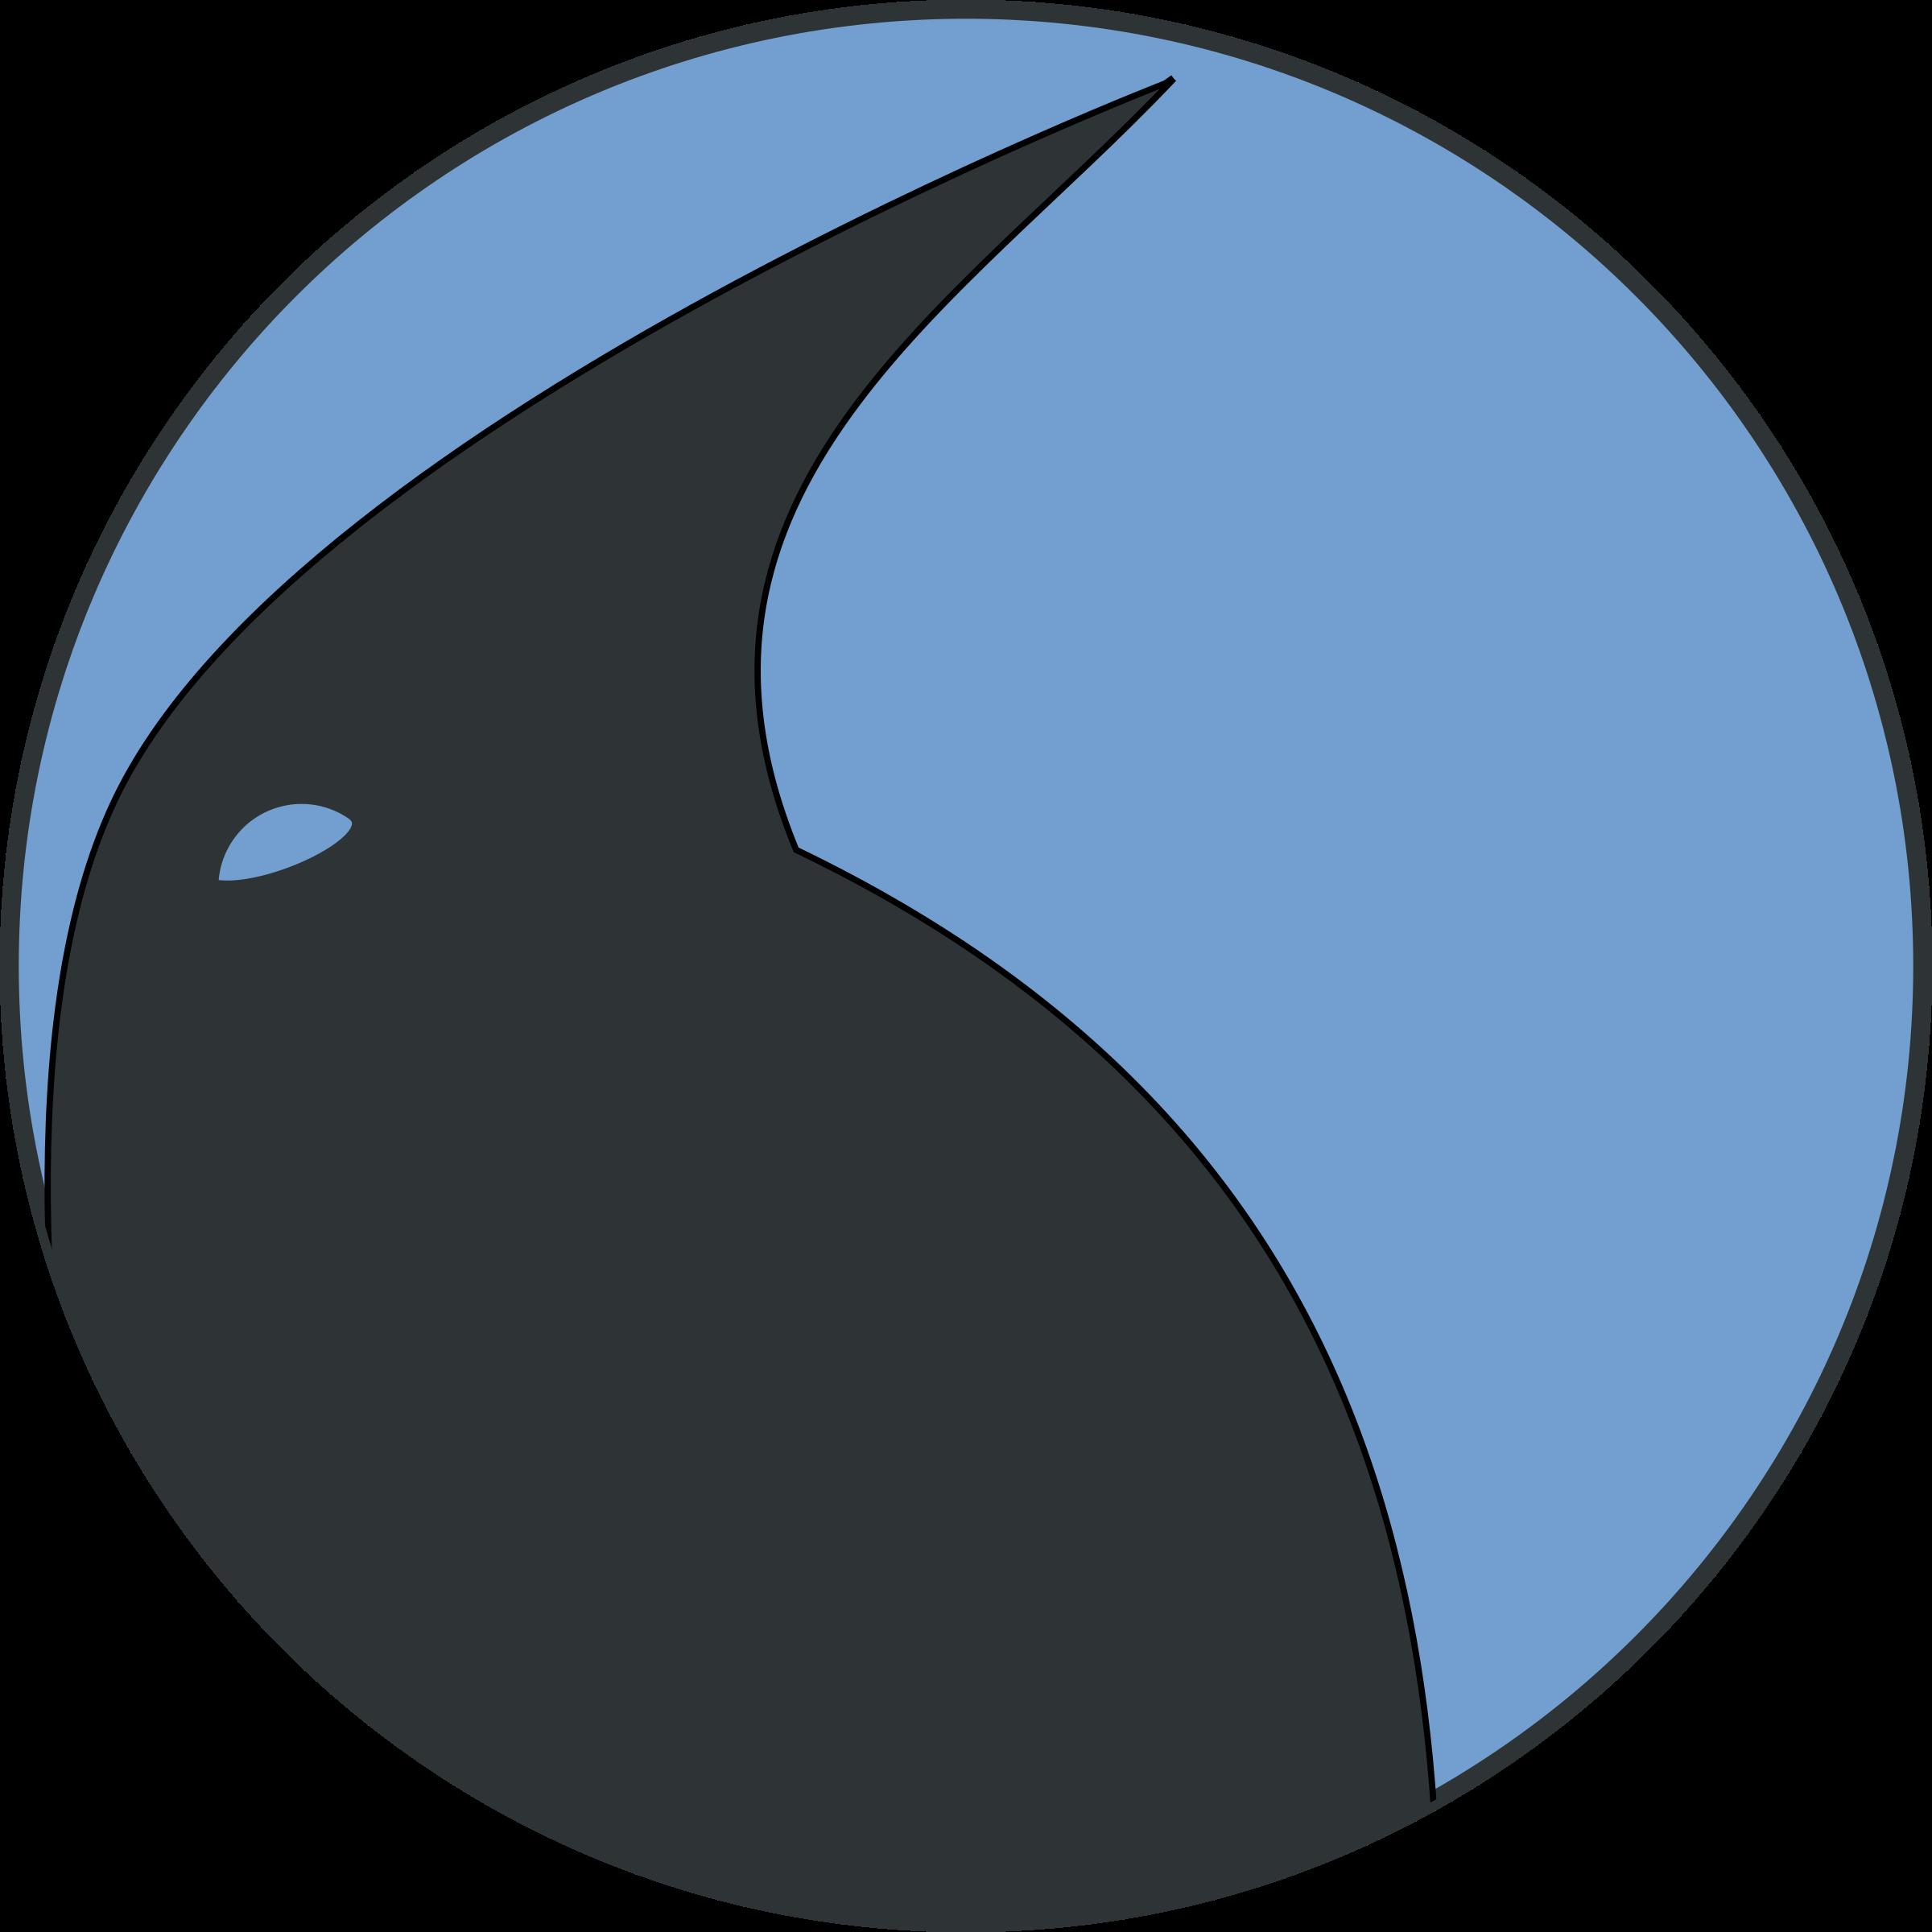 Medalion big image png. Penguin clipart profile